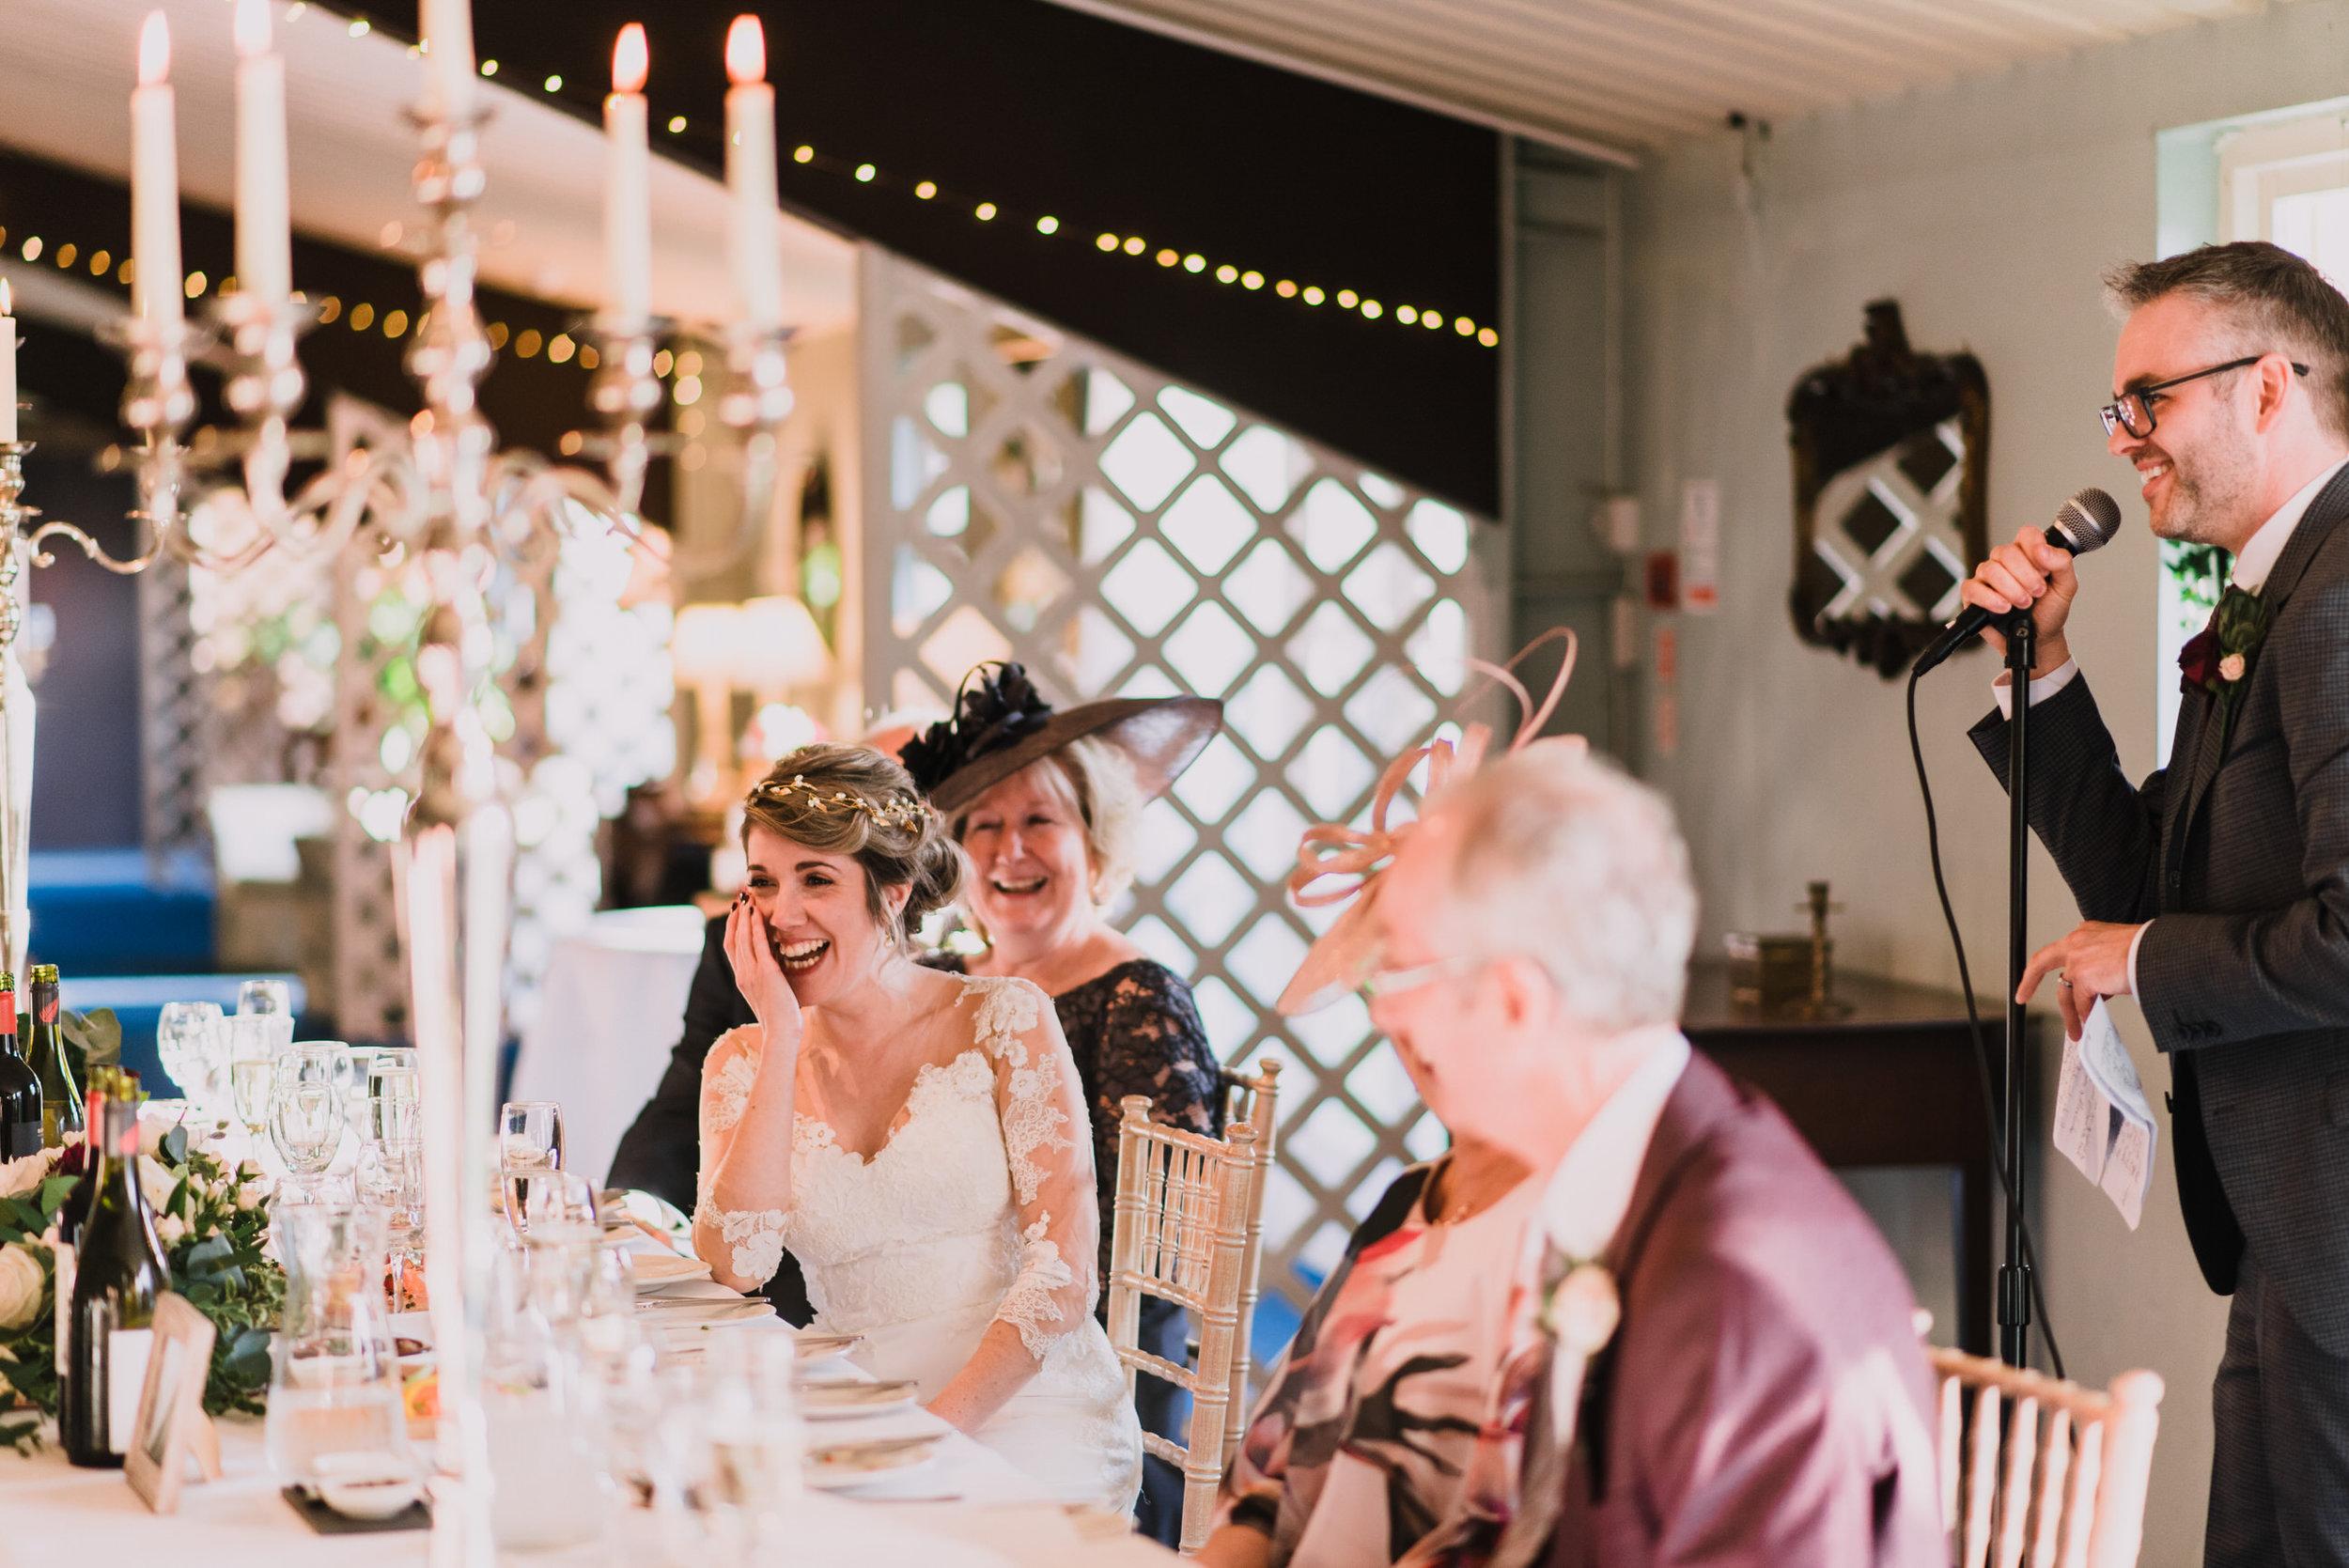 lissanoure castle wedding, northern ireland wedding photographer, romantic northern irish wedding venue, castle wedding ireland, natural wedding photography ni (116).jpg